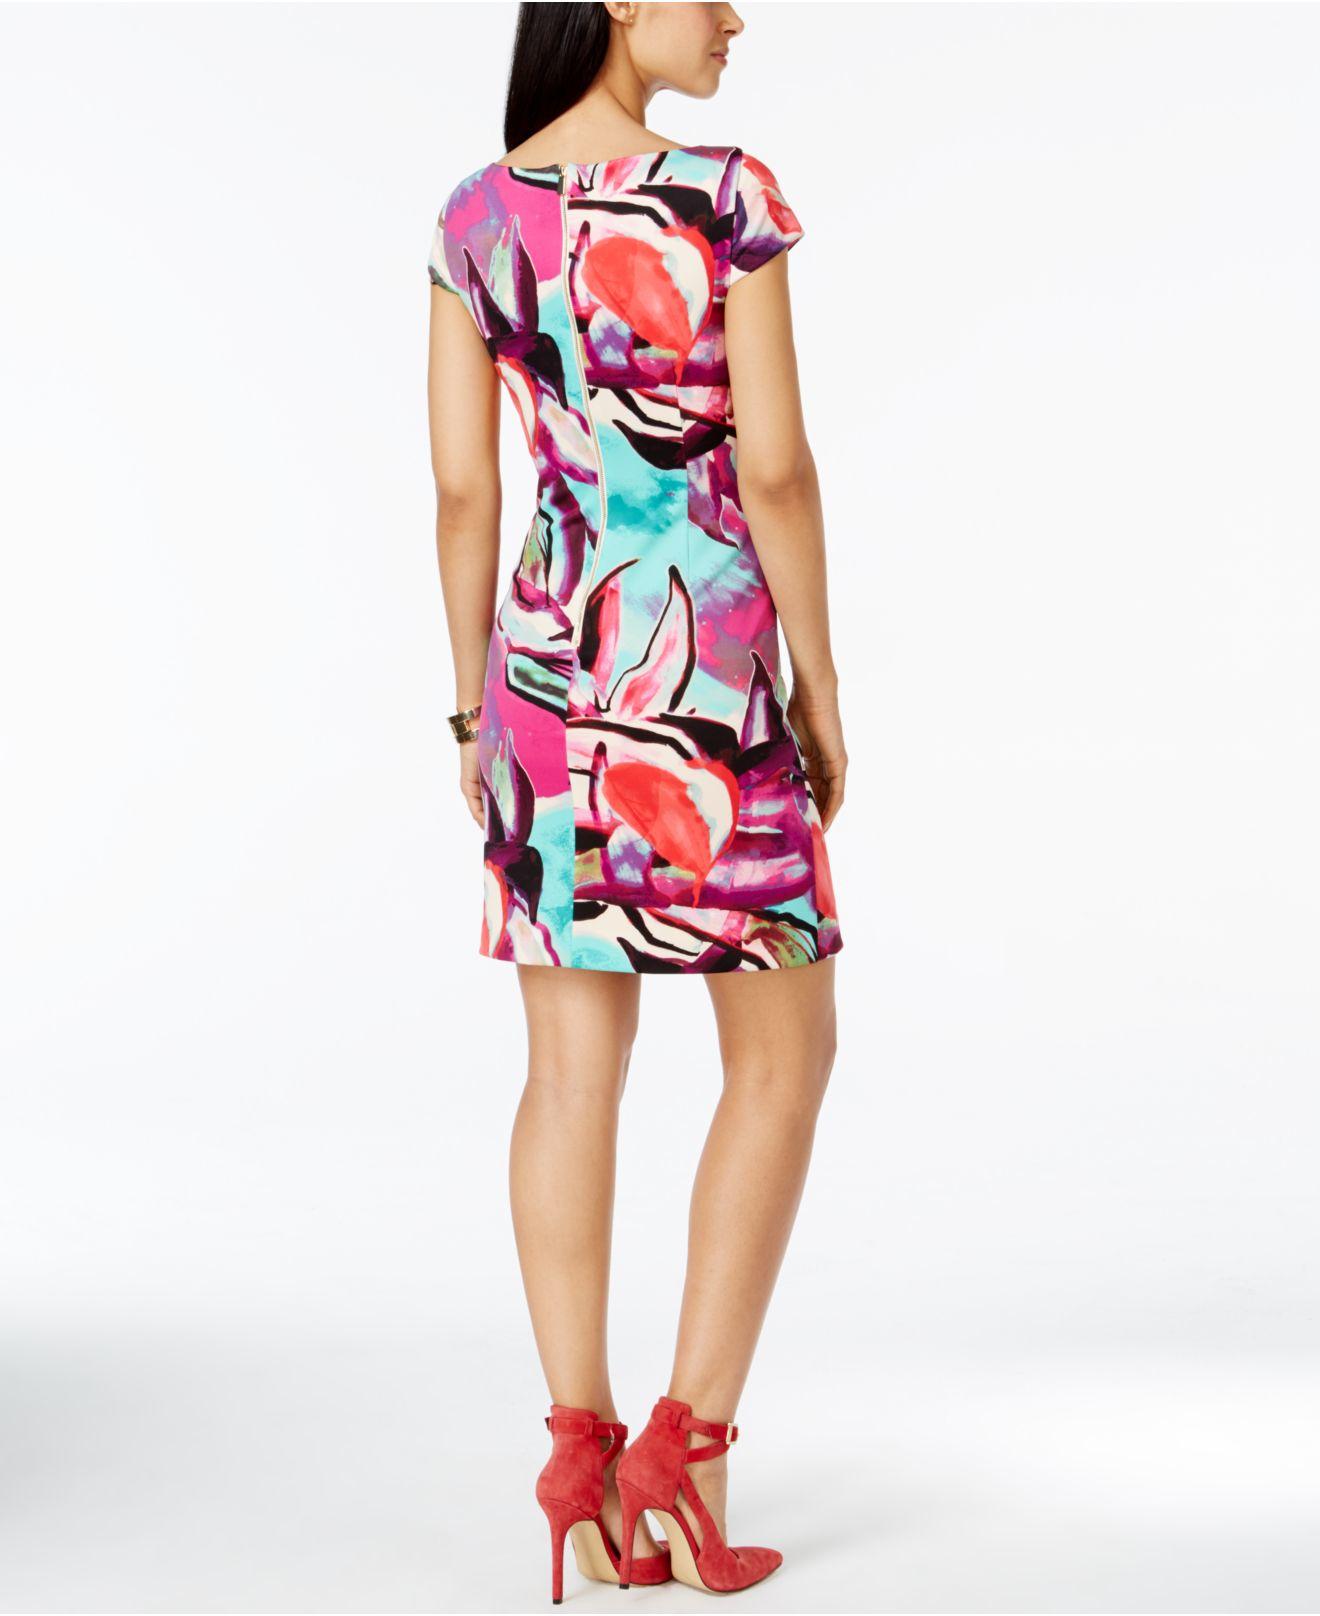 84aaee90 Vince Camuto Cap-sleeve Exploded Floral Print Sheath Dress - Lyst